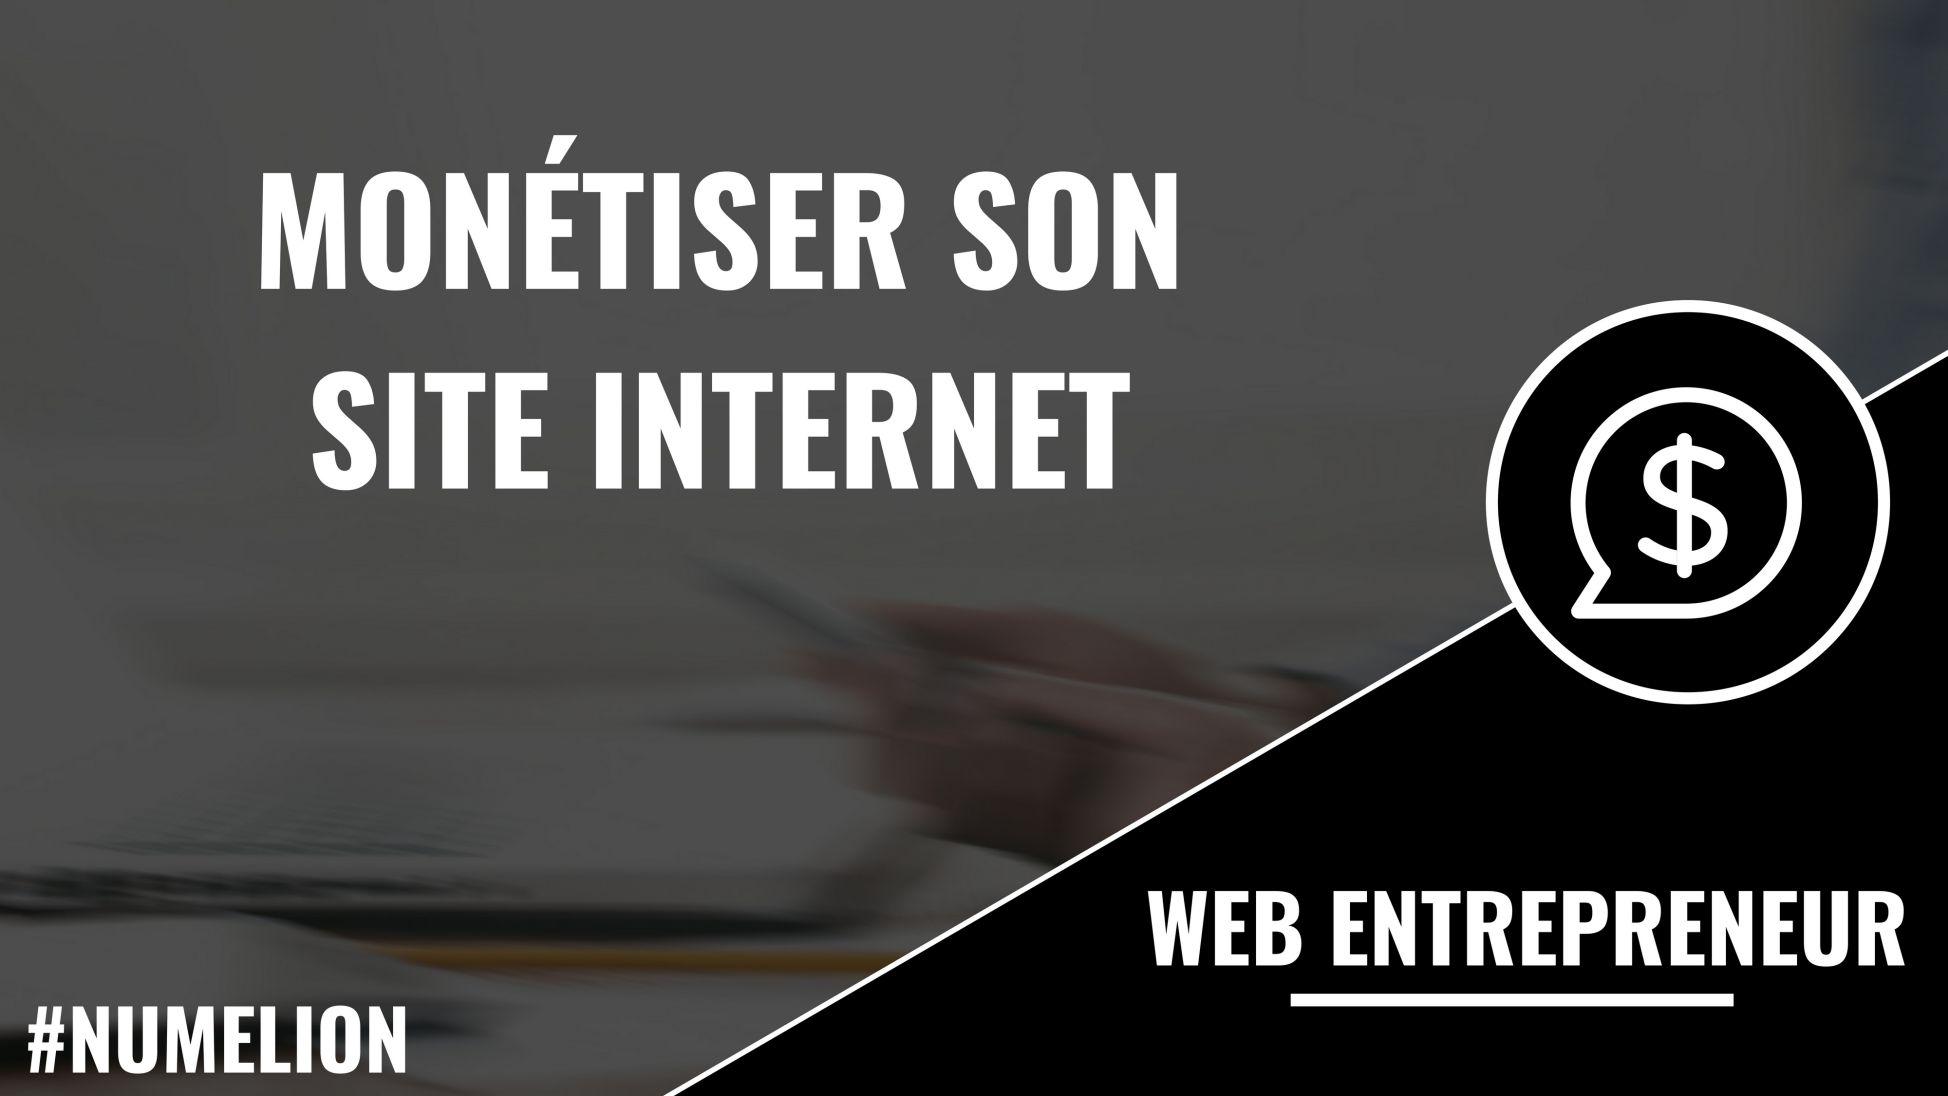 Monétiser son site internet